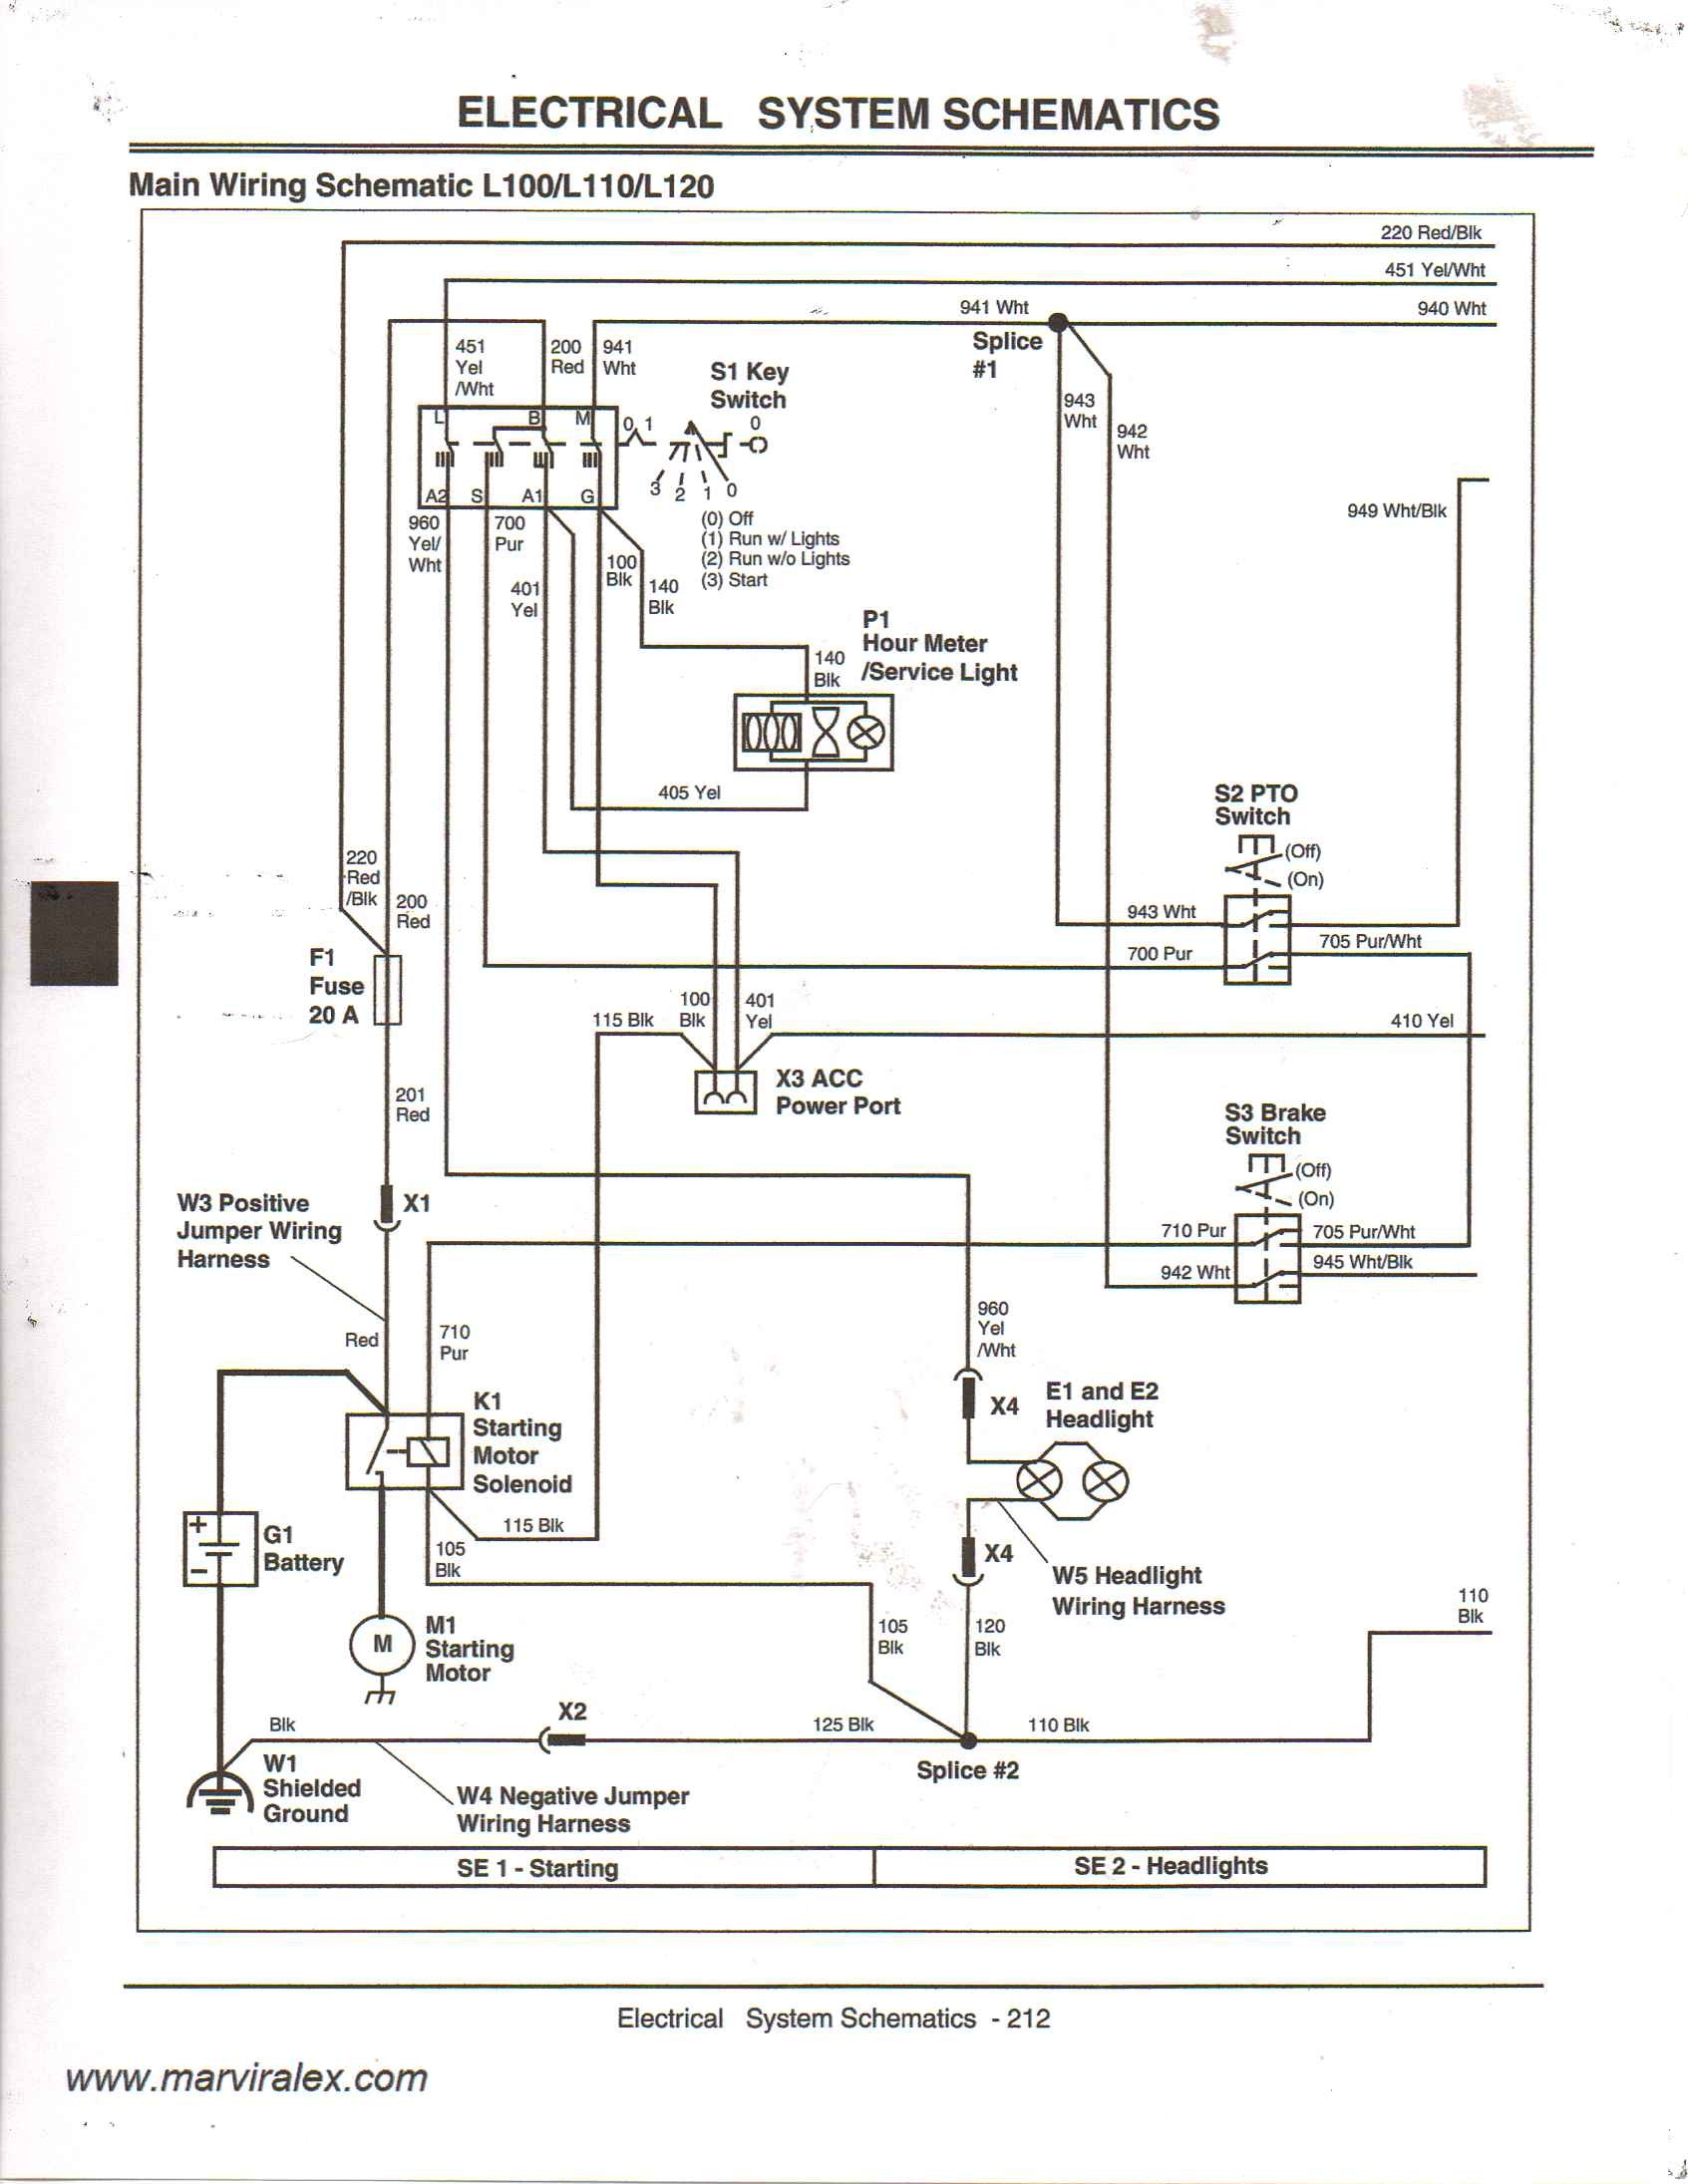 Jd 345 Electrical Diagram Cb 4290] for John Deere 1050 Tractor Wiring Diagram Of Jd 345 Electrical Diagram